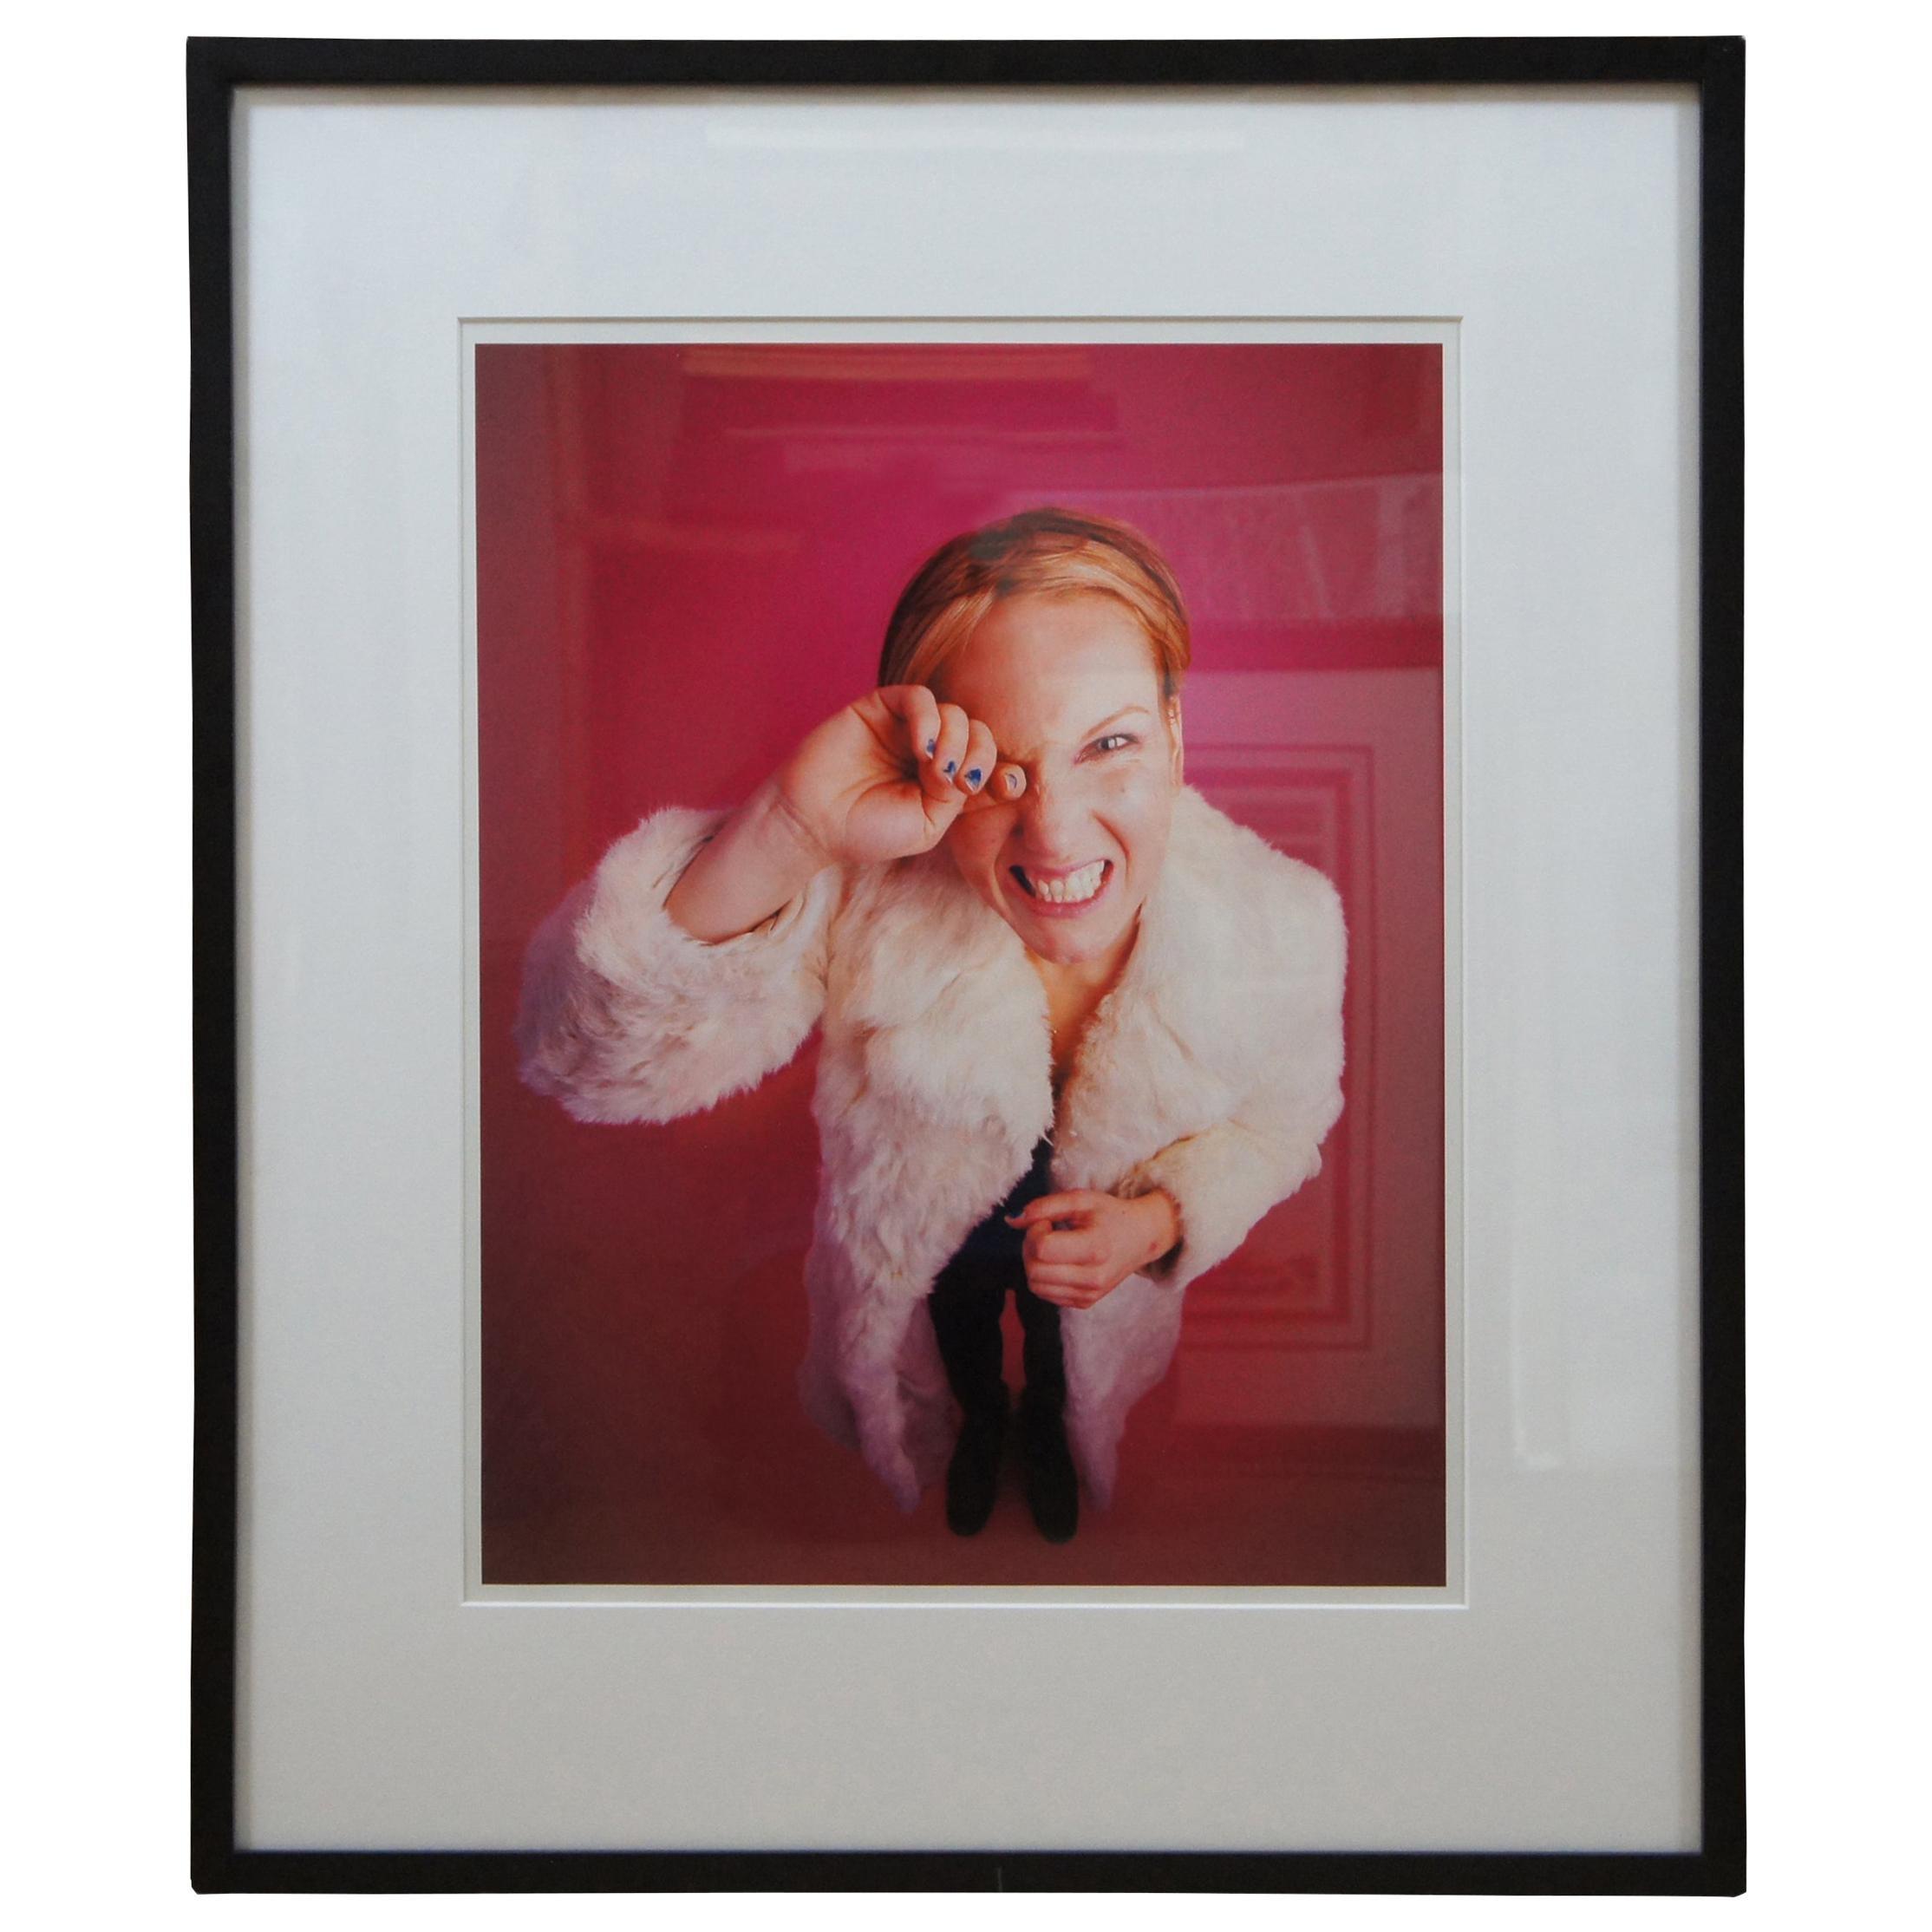 Rita Ackermann by Michael Lavine 1996 C-Print Chromogenic Portrait Photograph